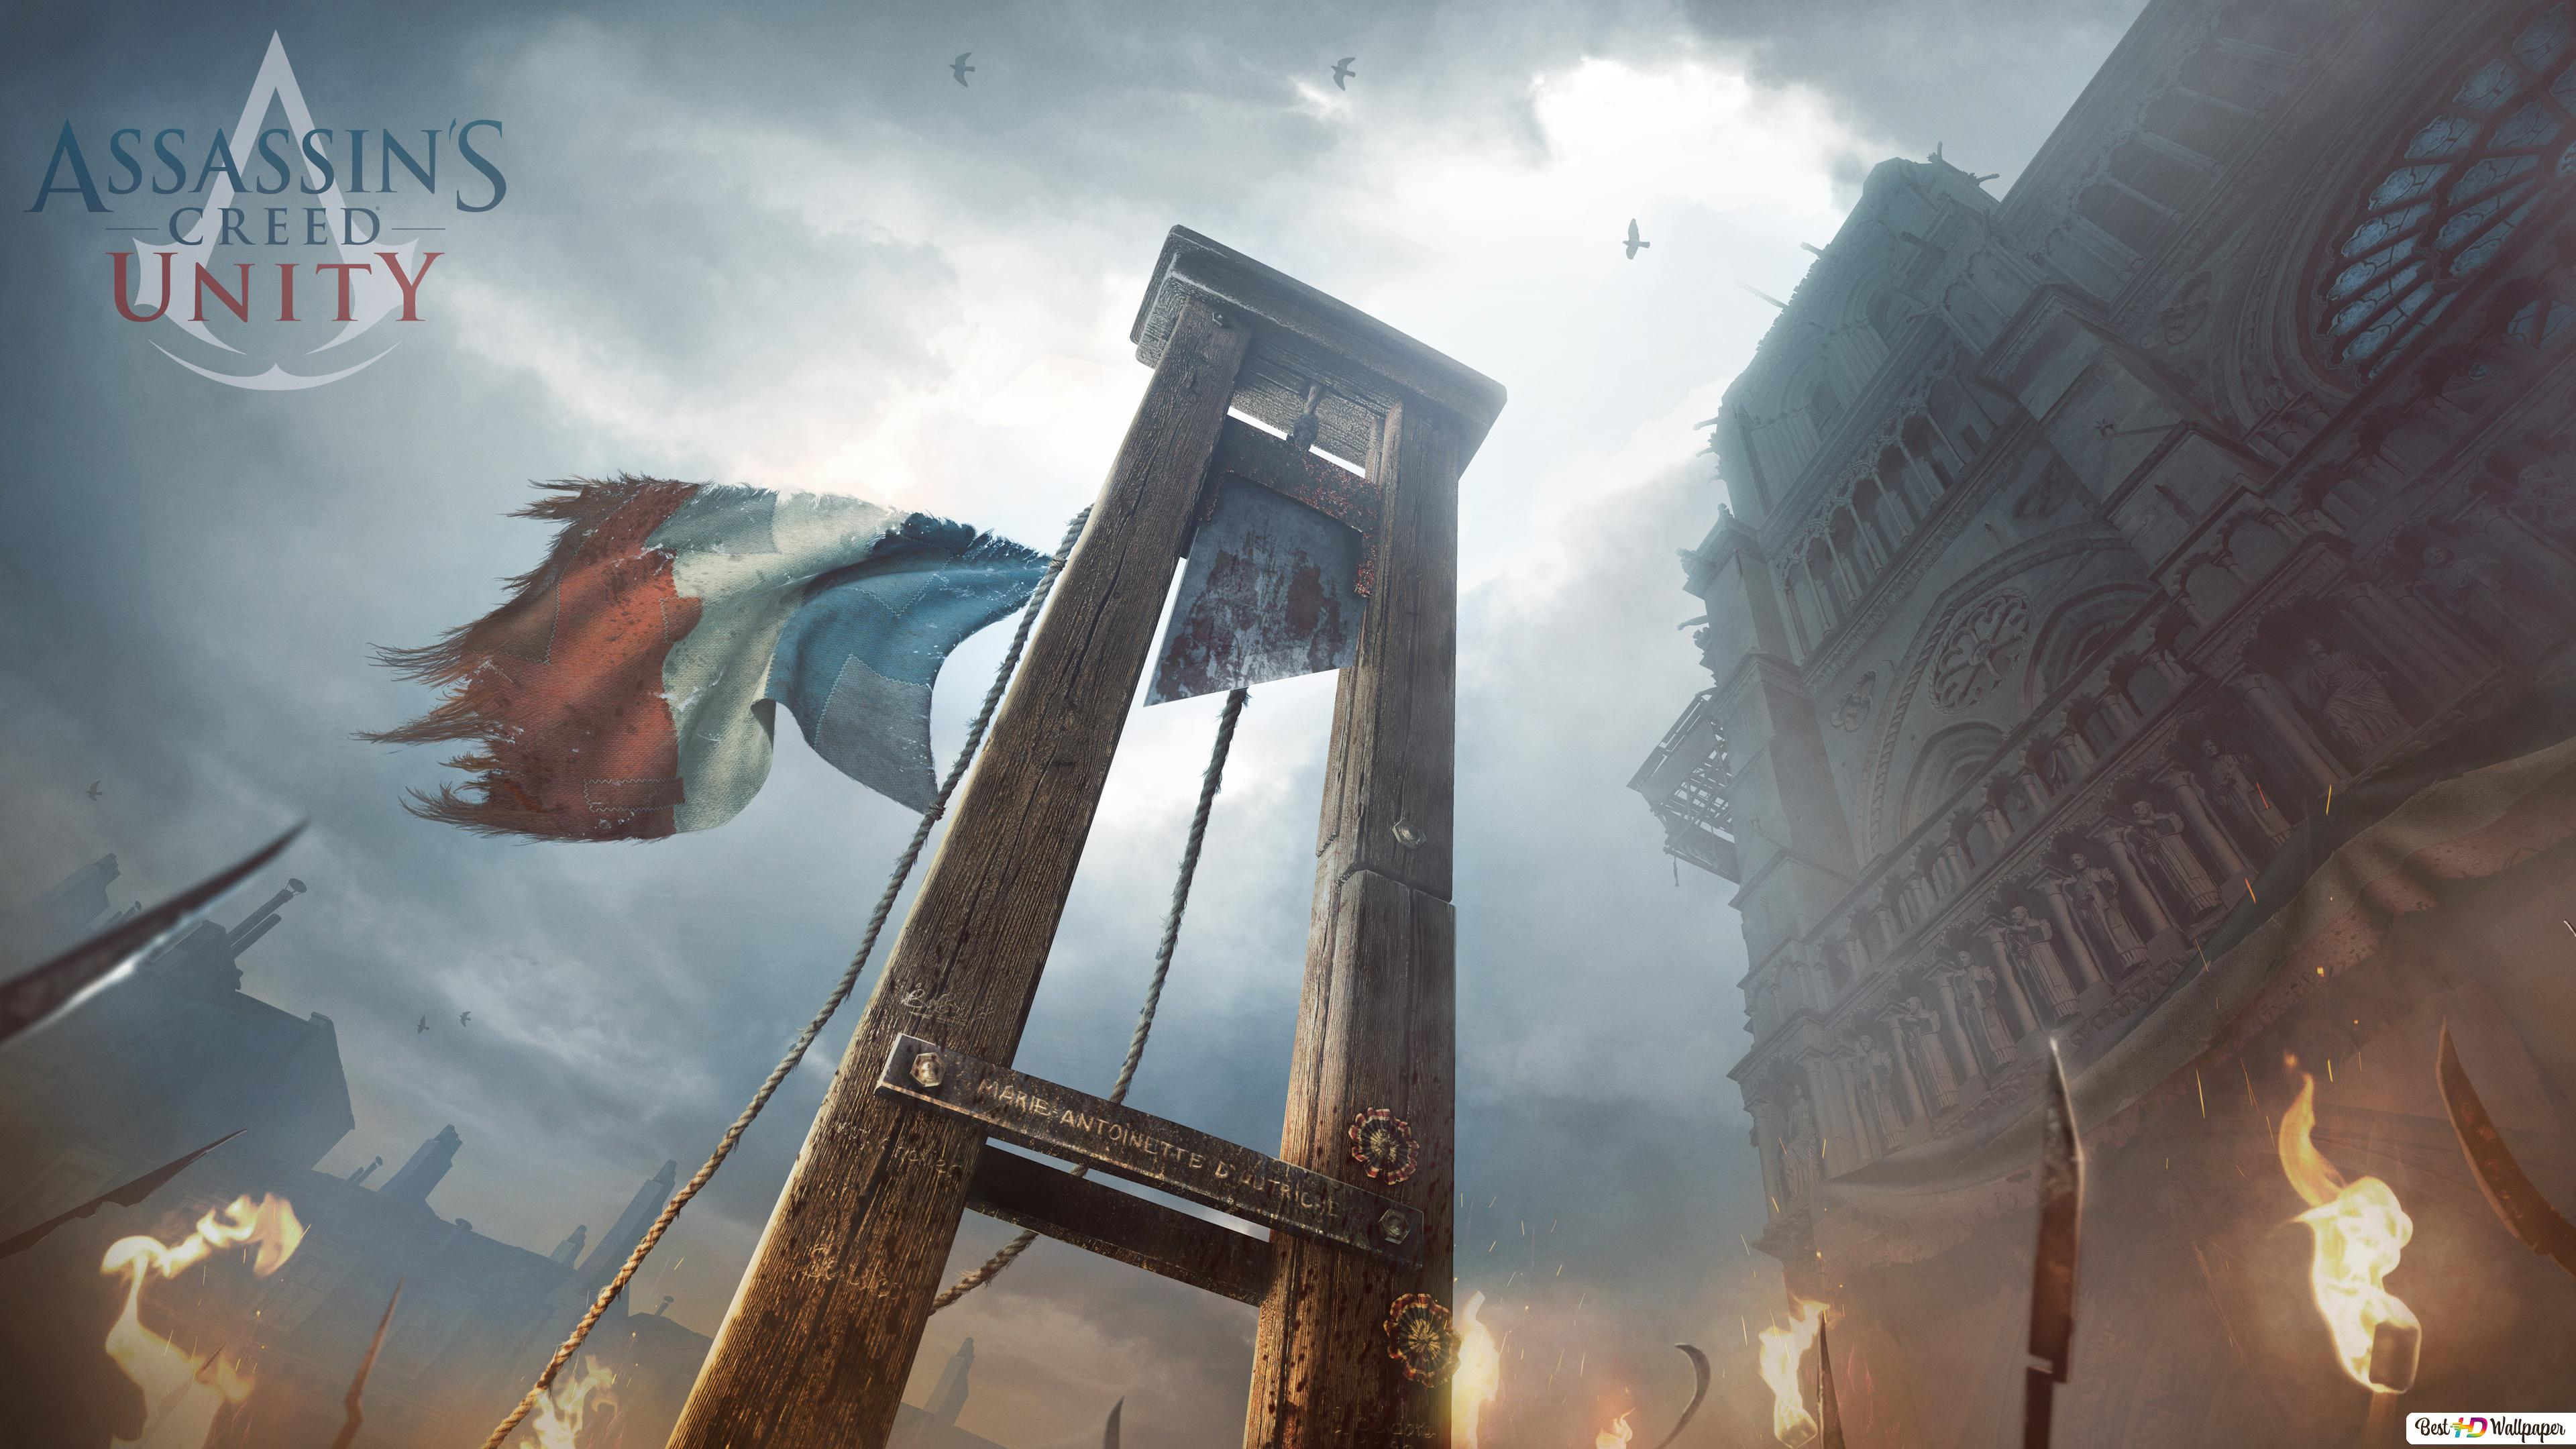 Assassin's Creed Unity HD wallpaper